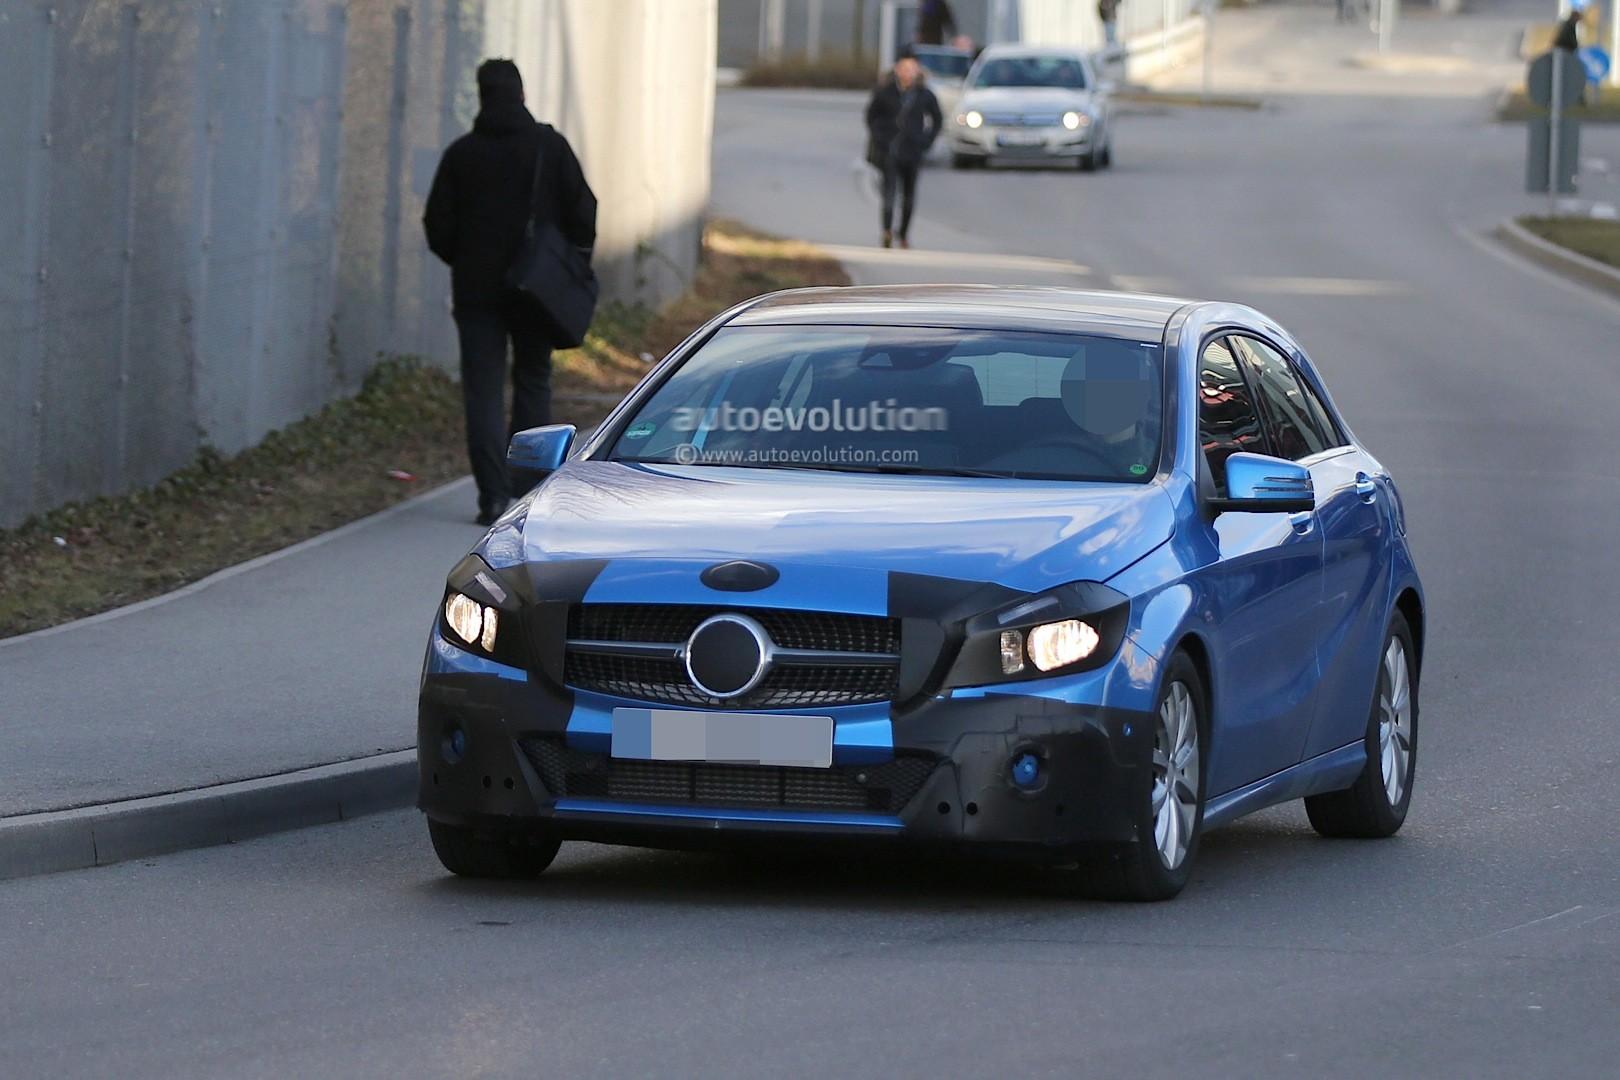 2016 - [Mercedes] Classe A restylée - Page 5 Spyshots-2015-mercedes-a-class-facelift-getting-headlight-tweaks_1